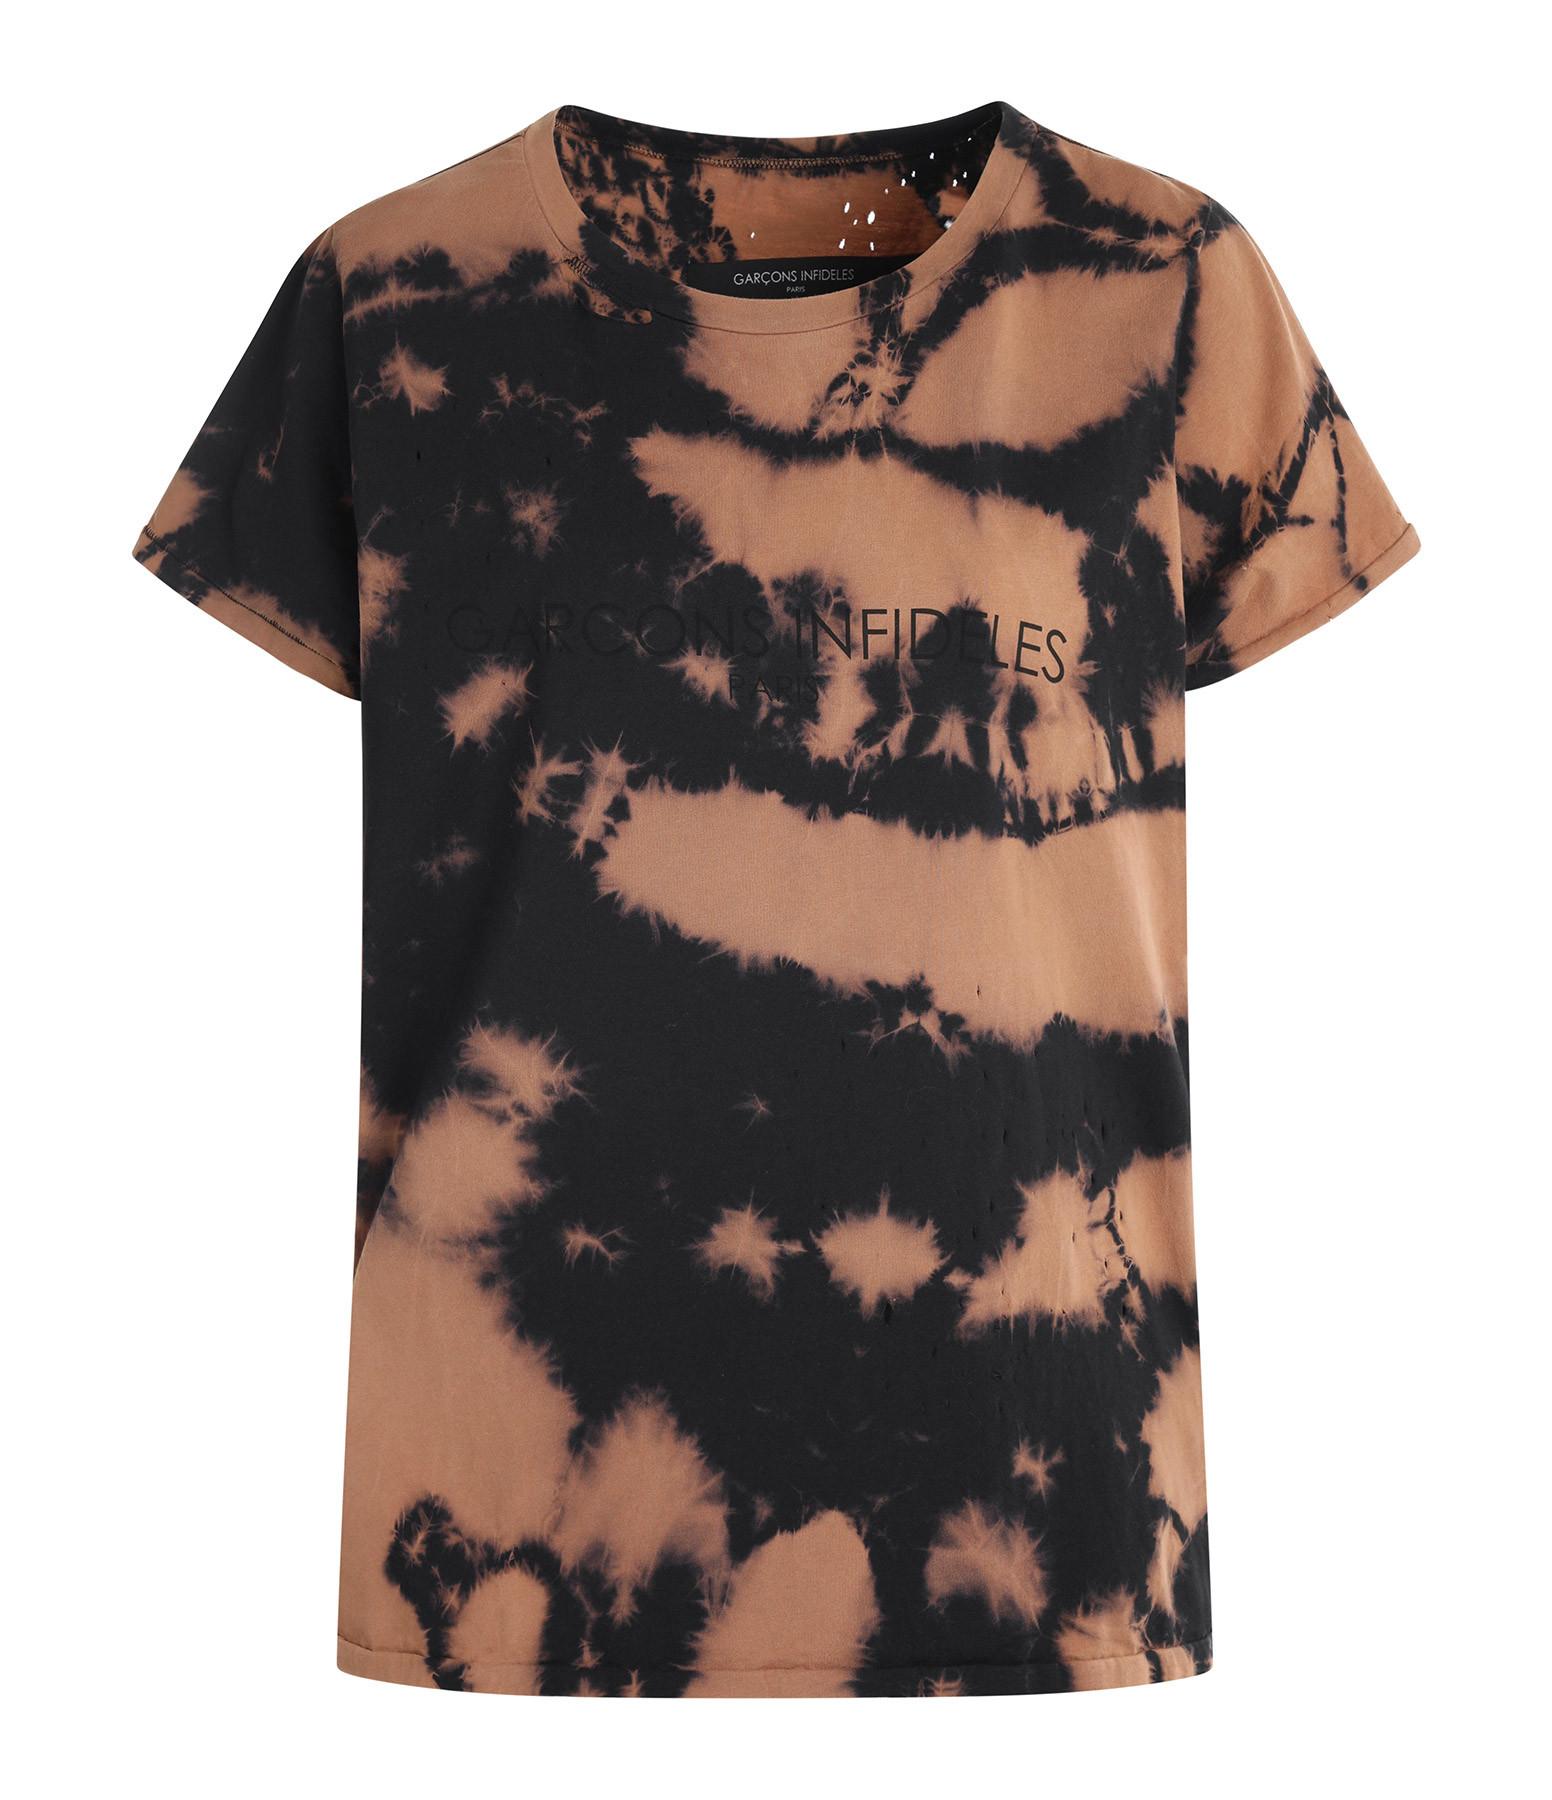 GARCONS INFIDELES - Tee-shirt Tie Die Coton Noir